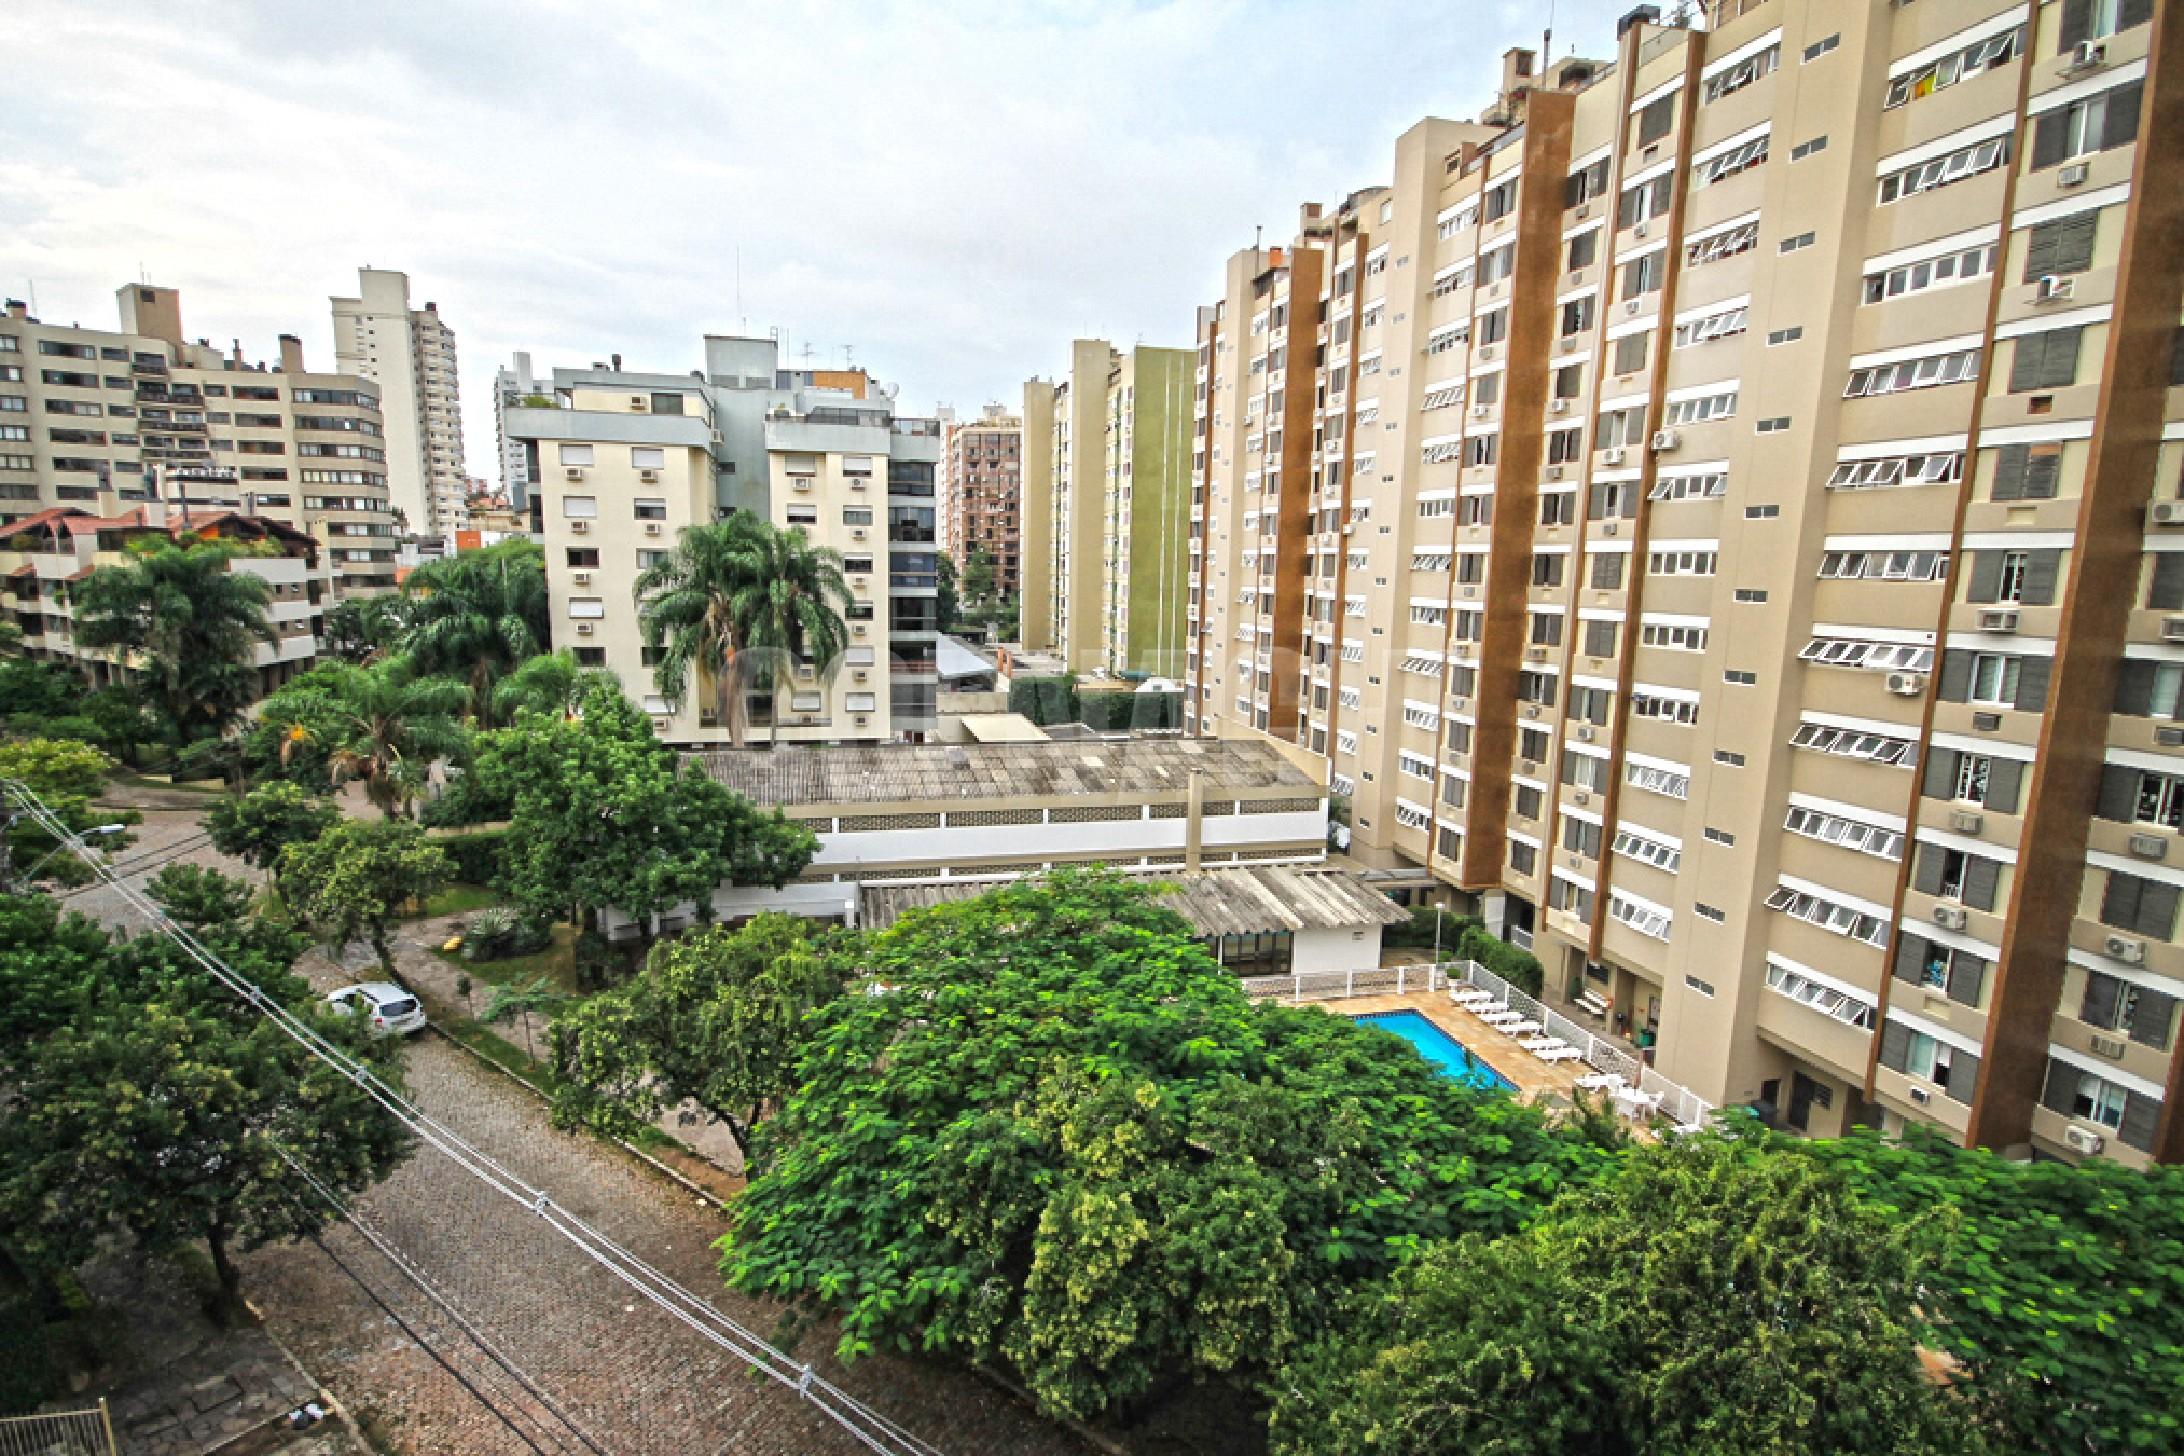 Edificio Vila Di Capri - Apto 3 Dorm, Bela Vista, Porto Alegre - Foto 5